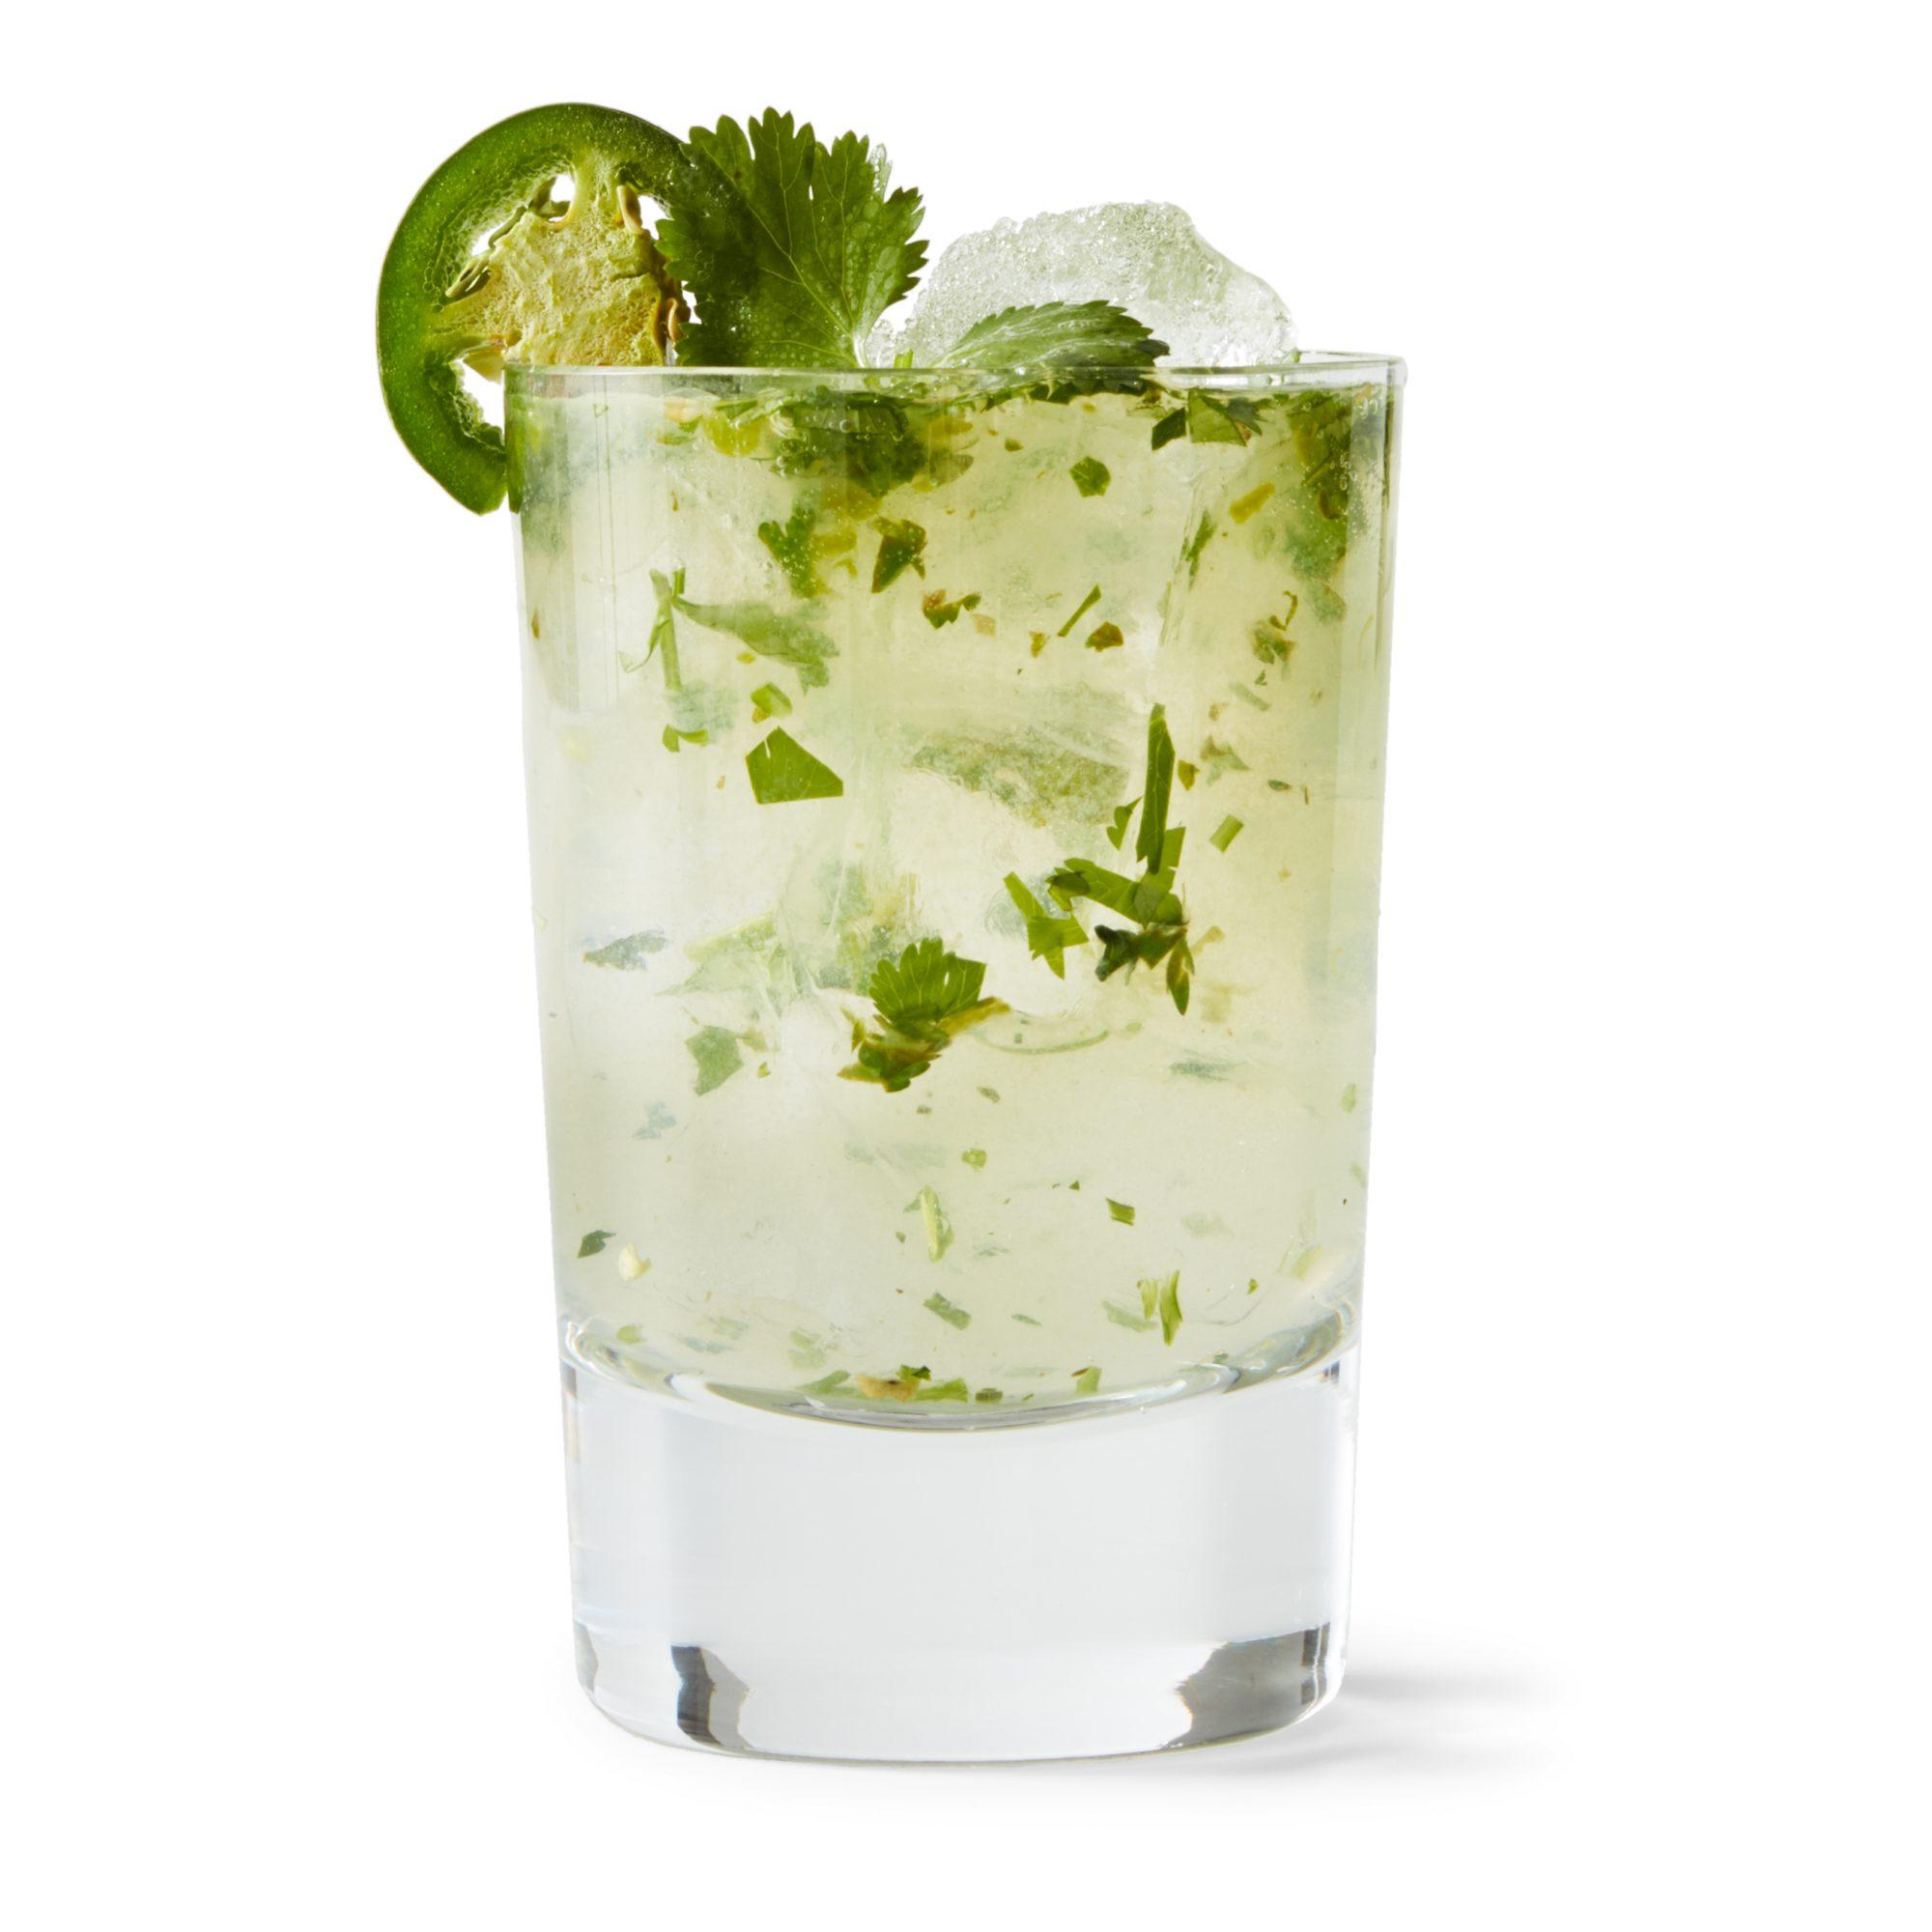 jalapeno citrus rickey cocktail